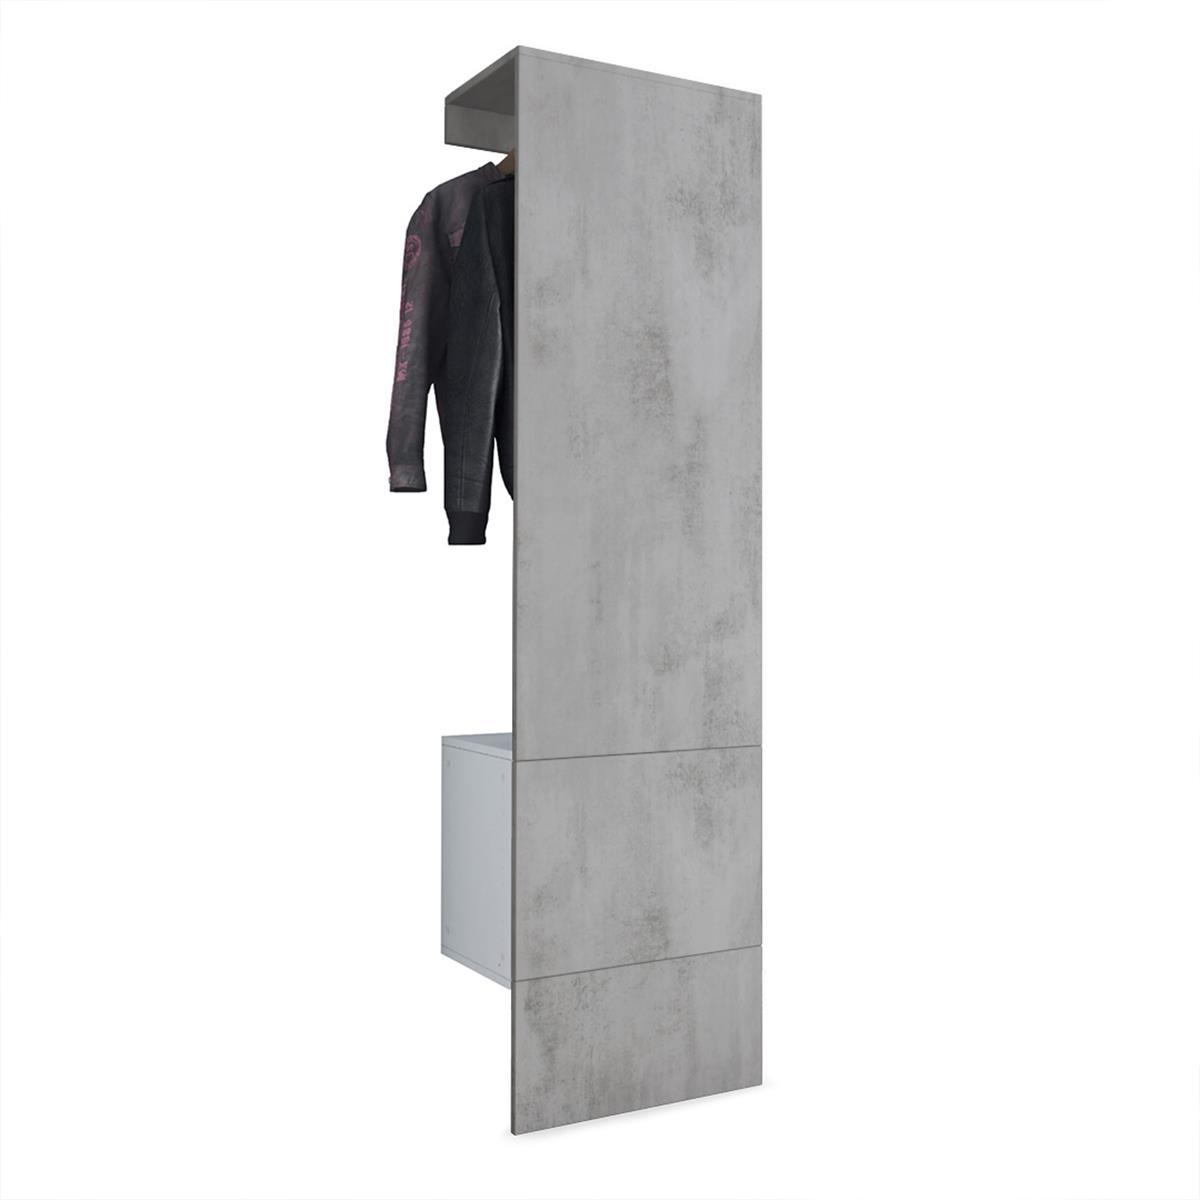 Garderobe carlton set 5 beton oxid optik for Garderobe carlton set 4